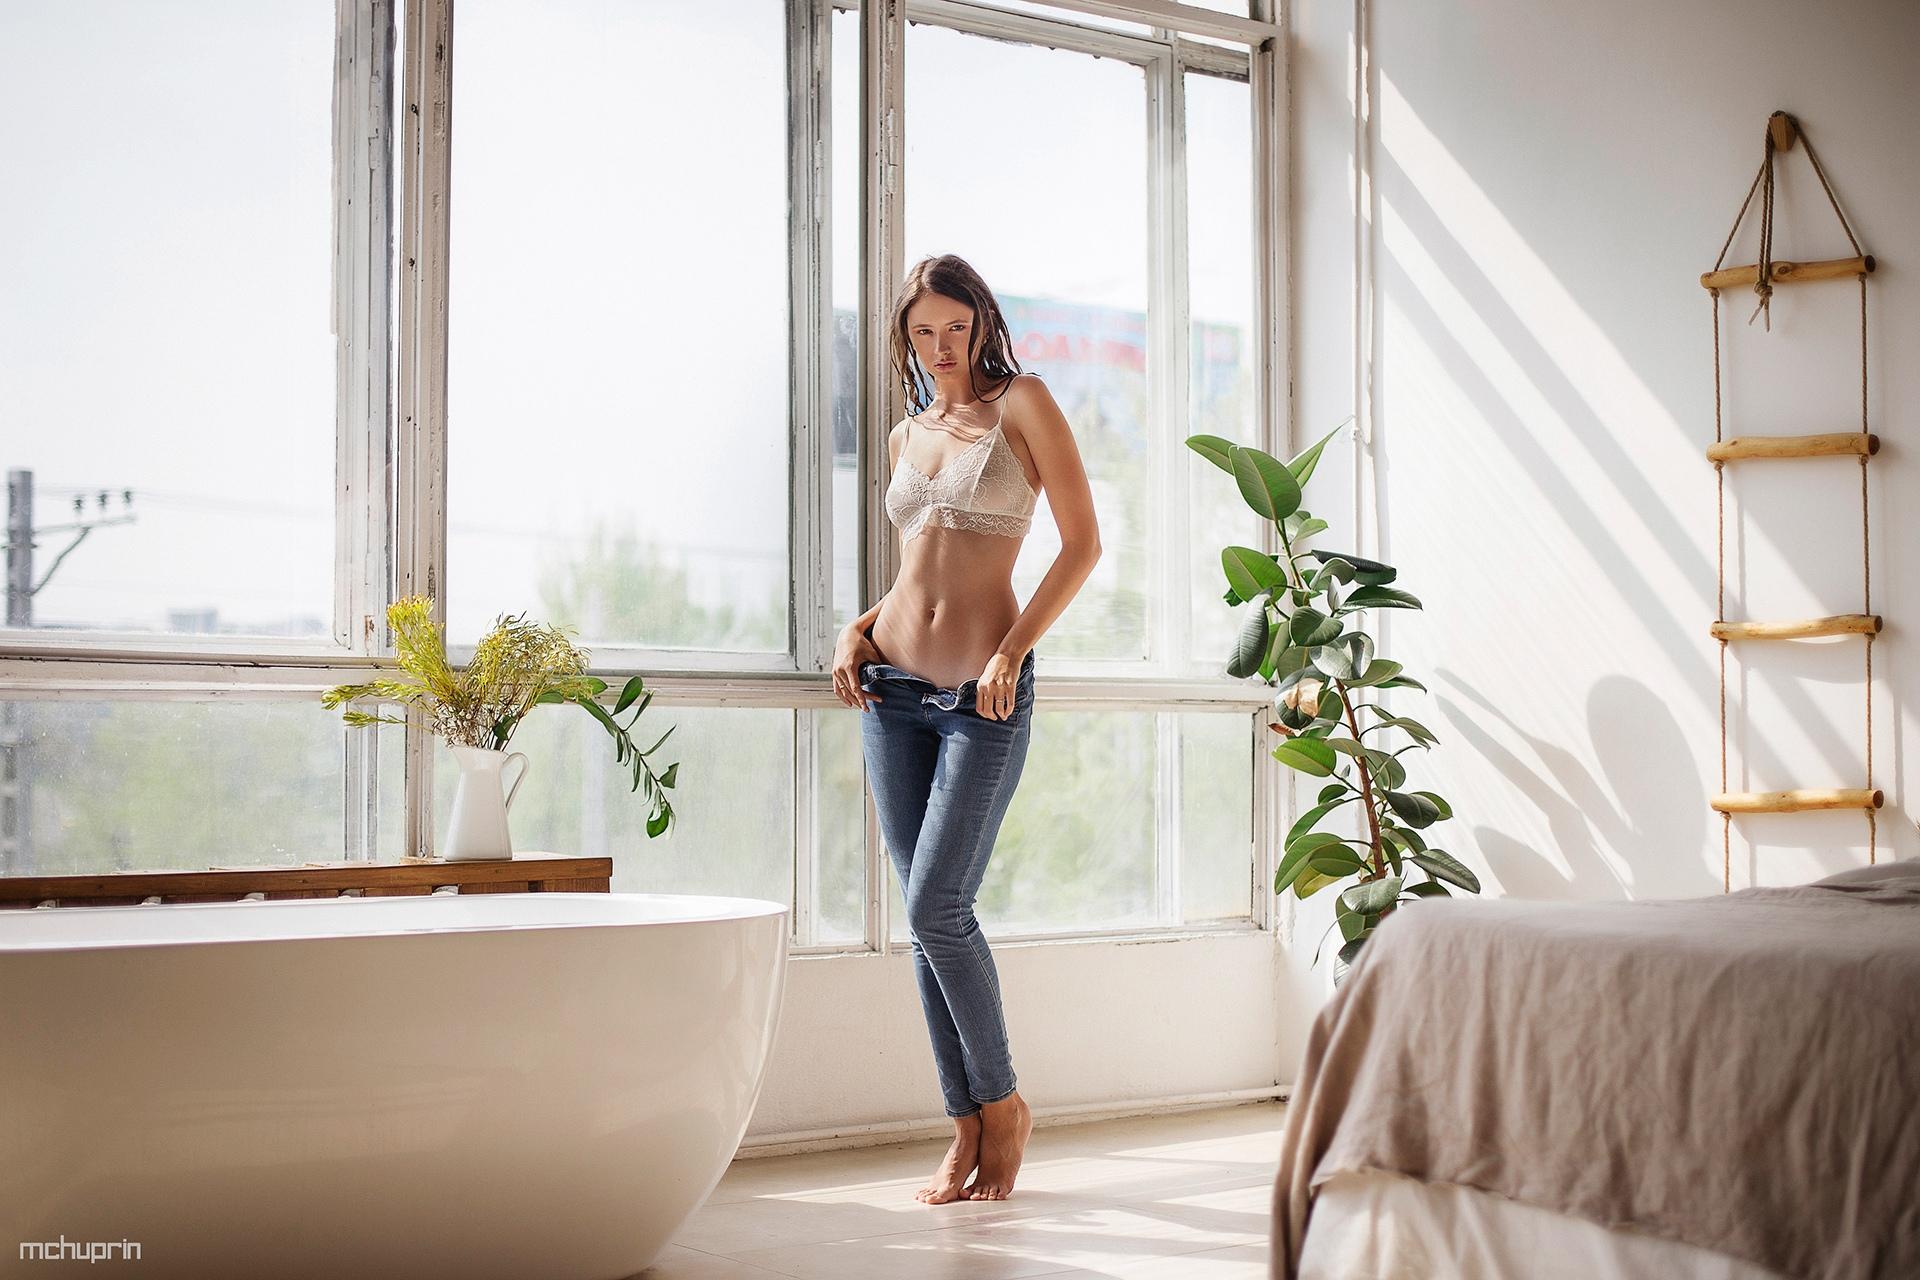 People 1920x1280 Disha Shemetova women model brunette looking at viewer lingerie bra white bra belly jeans denim barefoot window indoors women indoors Maksim Chuprin Maxim Chuprin Twistys tiptoe